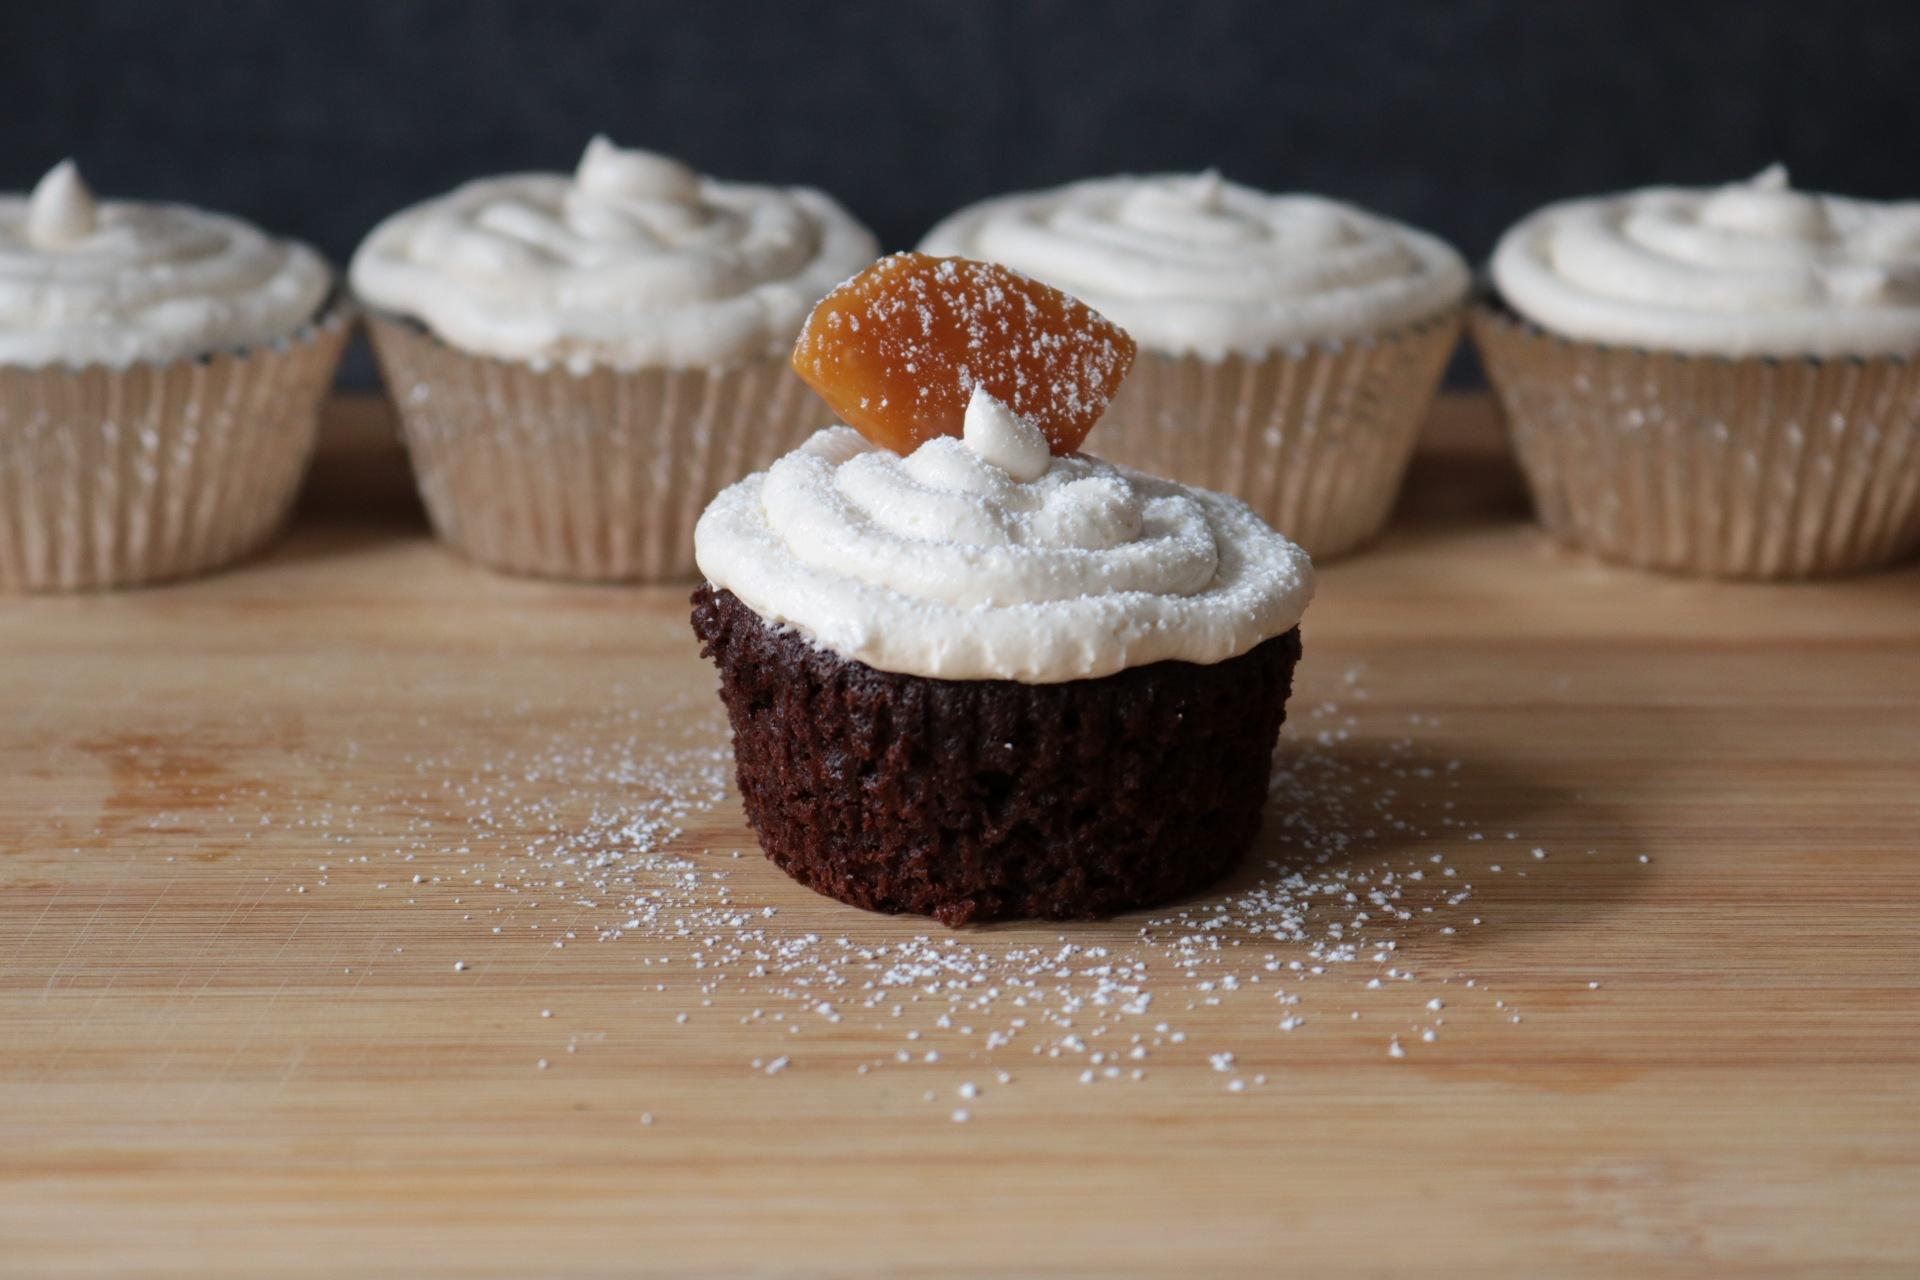 Chocolate Bourbon Cupcake